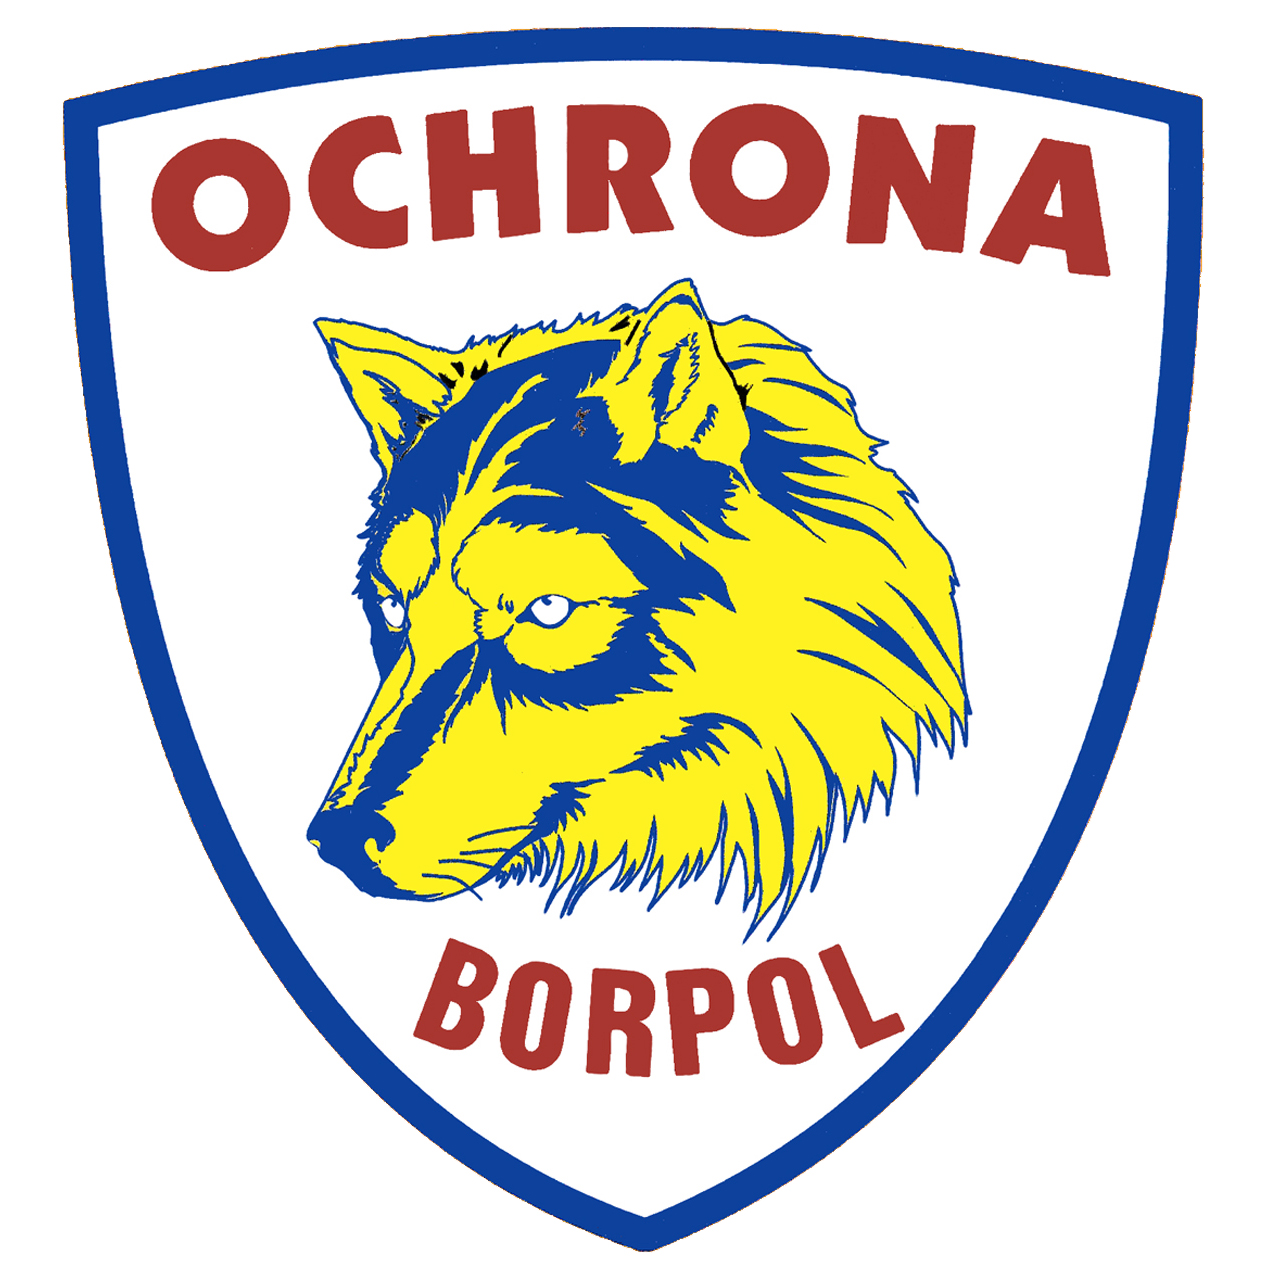 logo Borpol